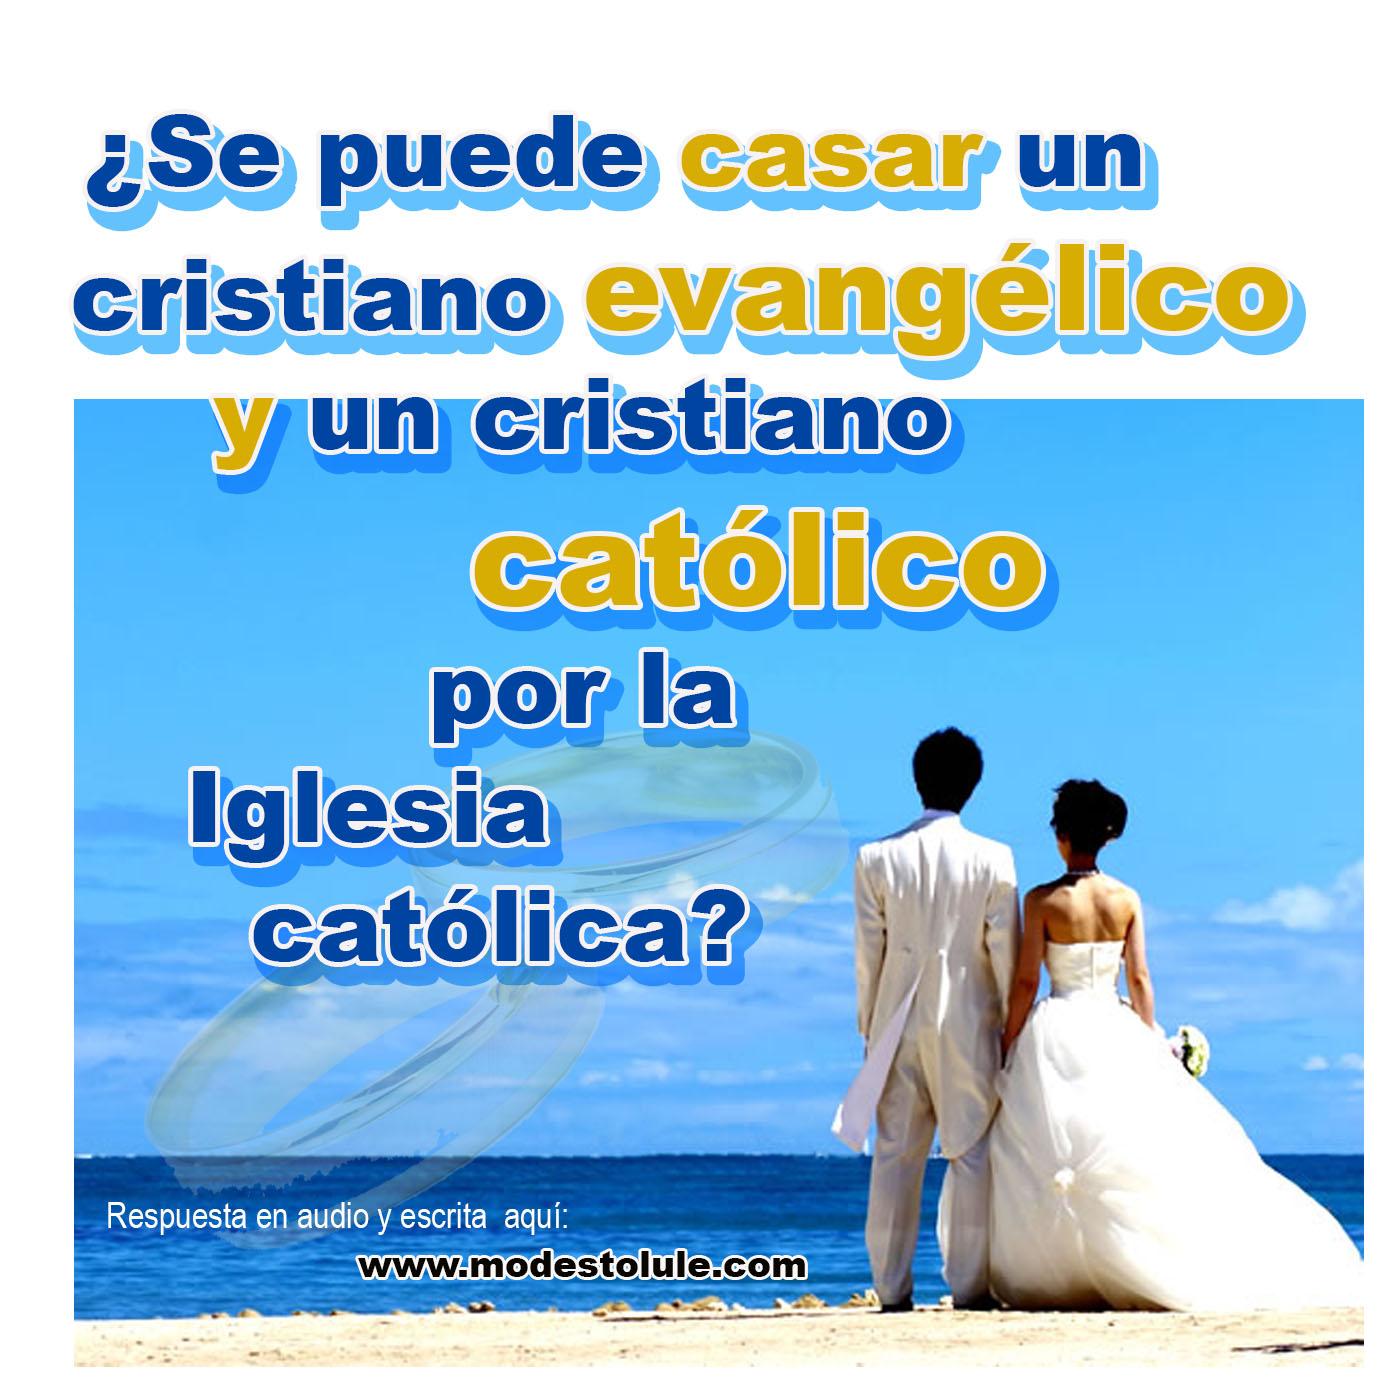 Matrimonio Mixto Catolico Ortodoxo : Matrimonio catÓlico ley canÓnica